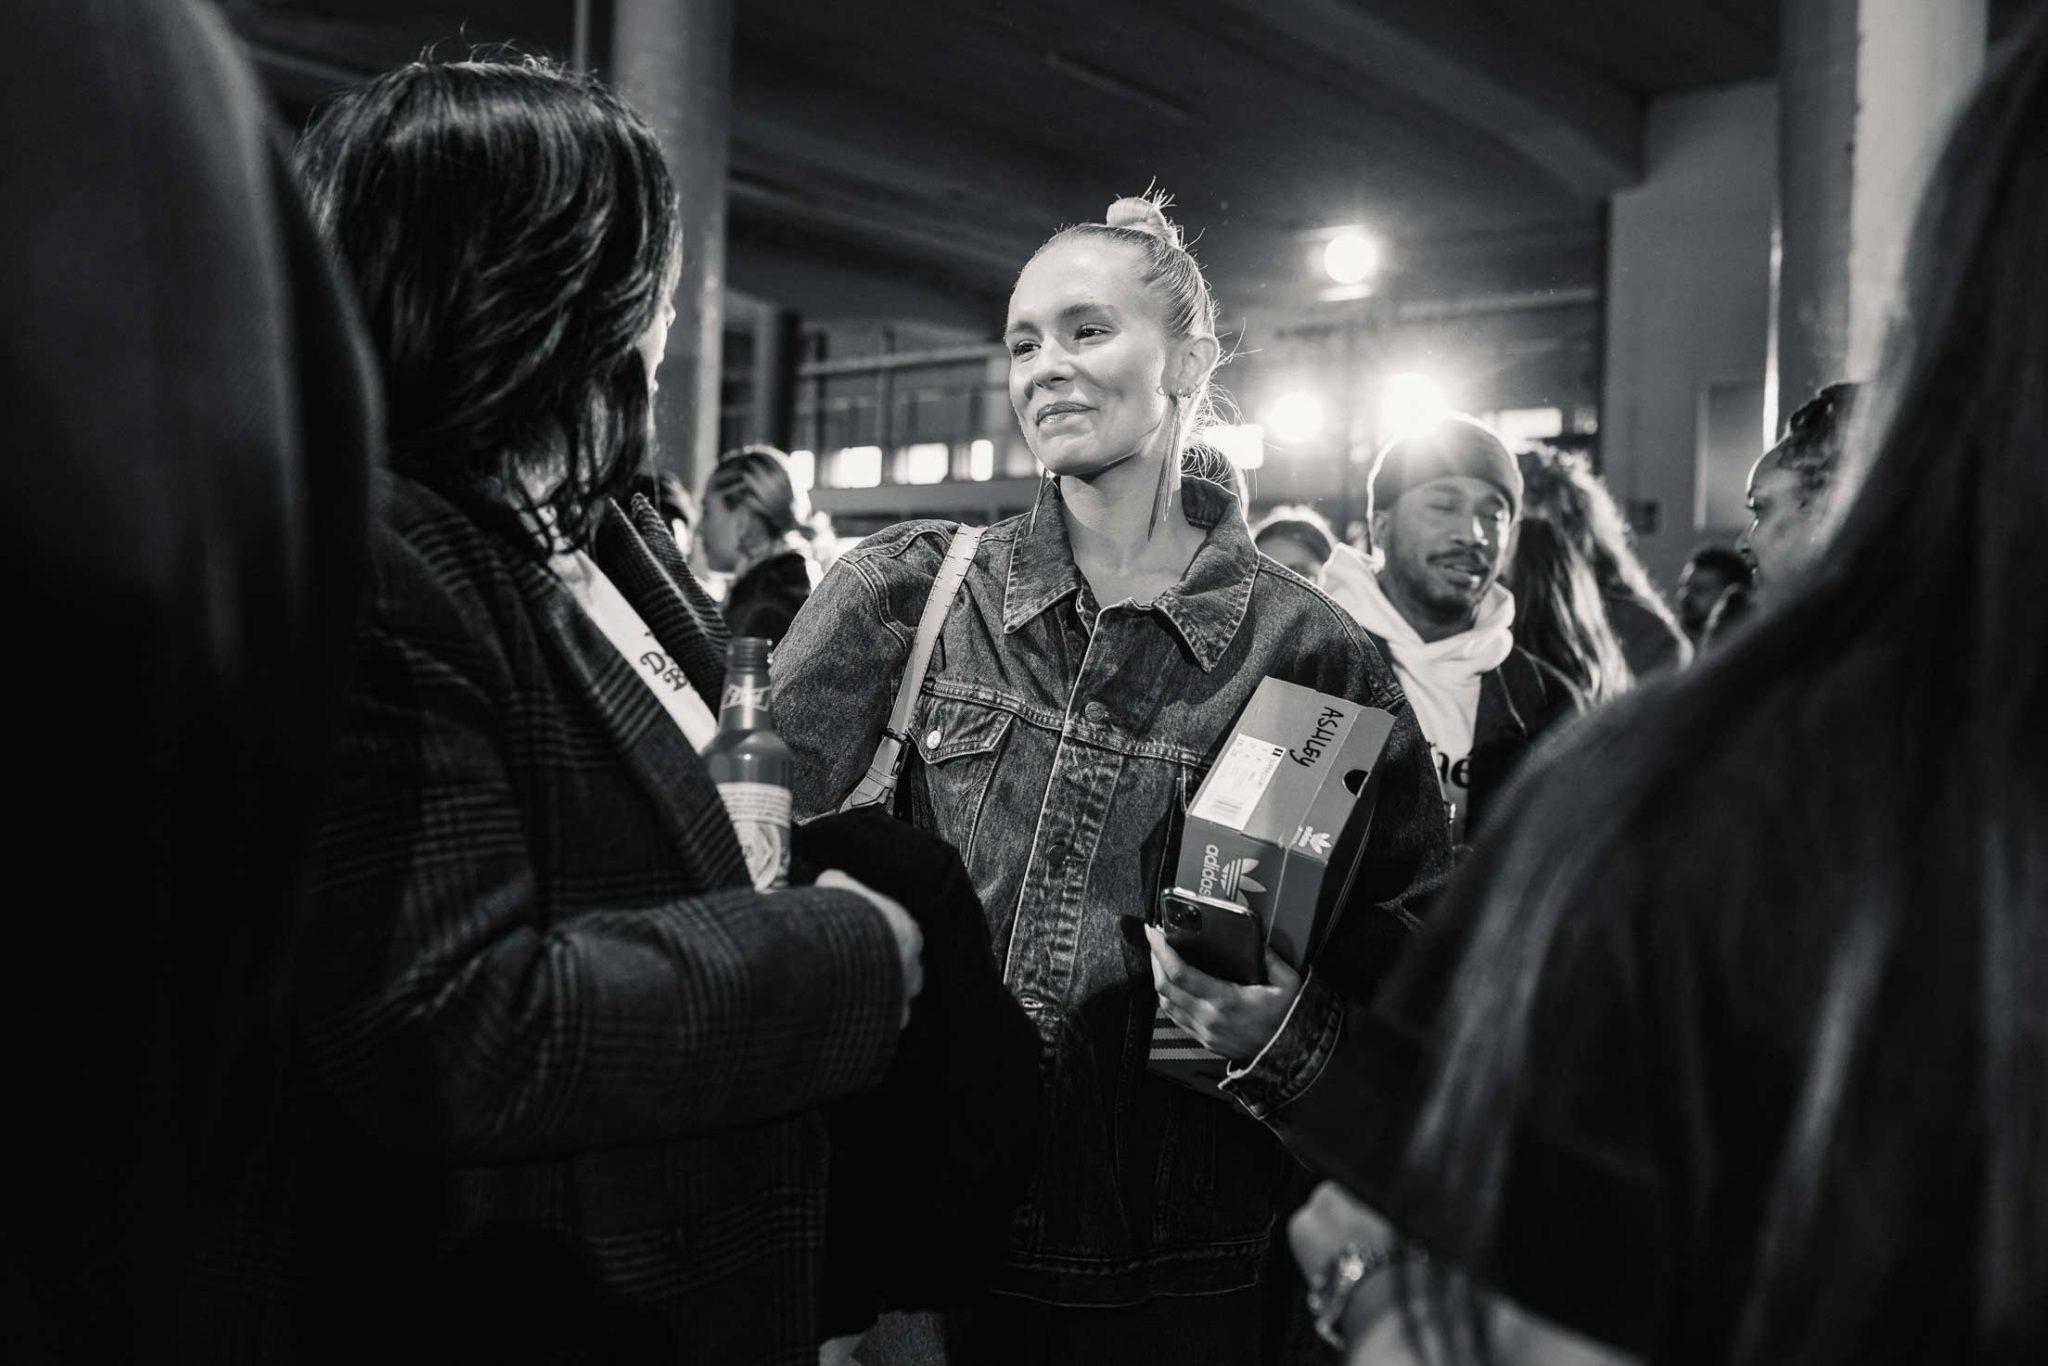 Ilsoo_van_Dijk_Ilsoovandijk_AFW_Toral_Backstage_Amsterdam_Fashion_week_2020_-scaled_17c